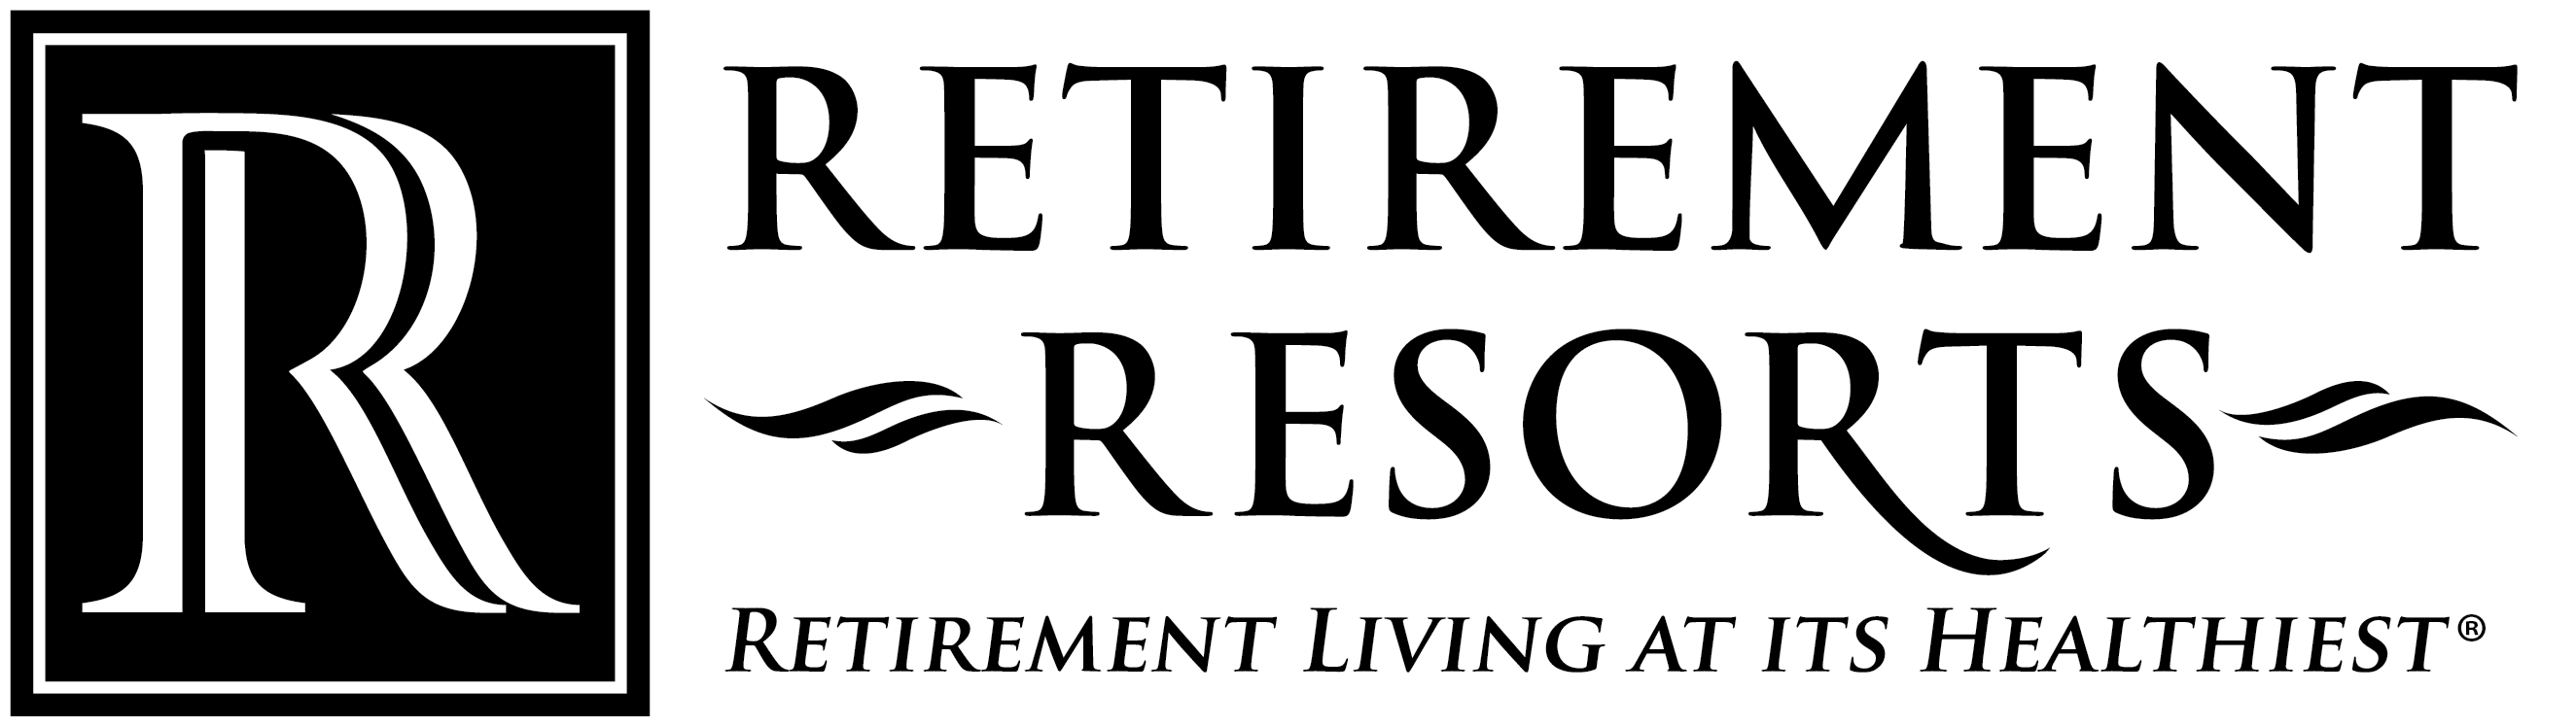 Retirement Resorts